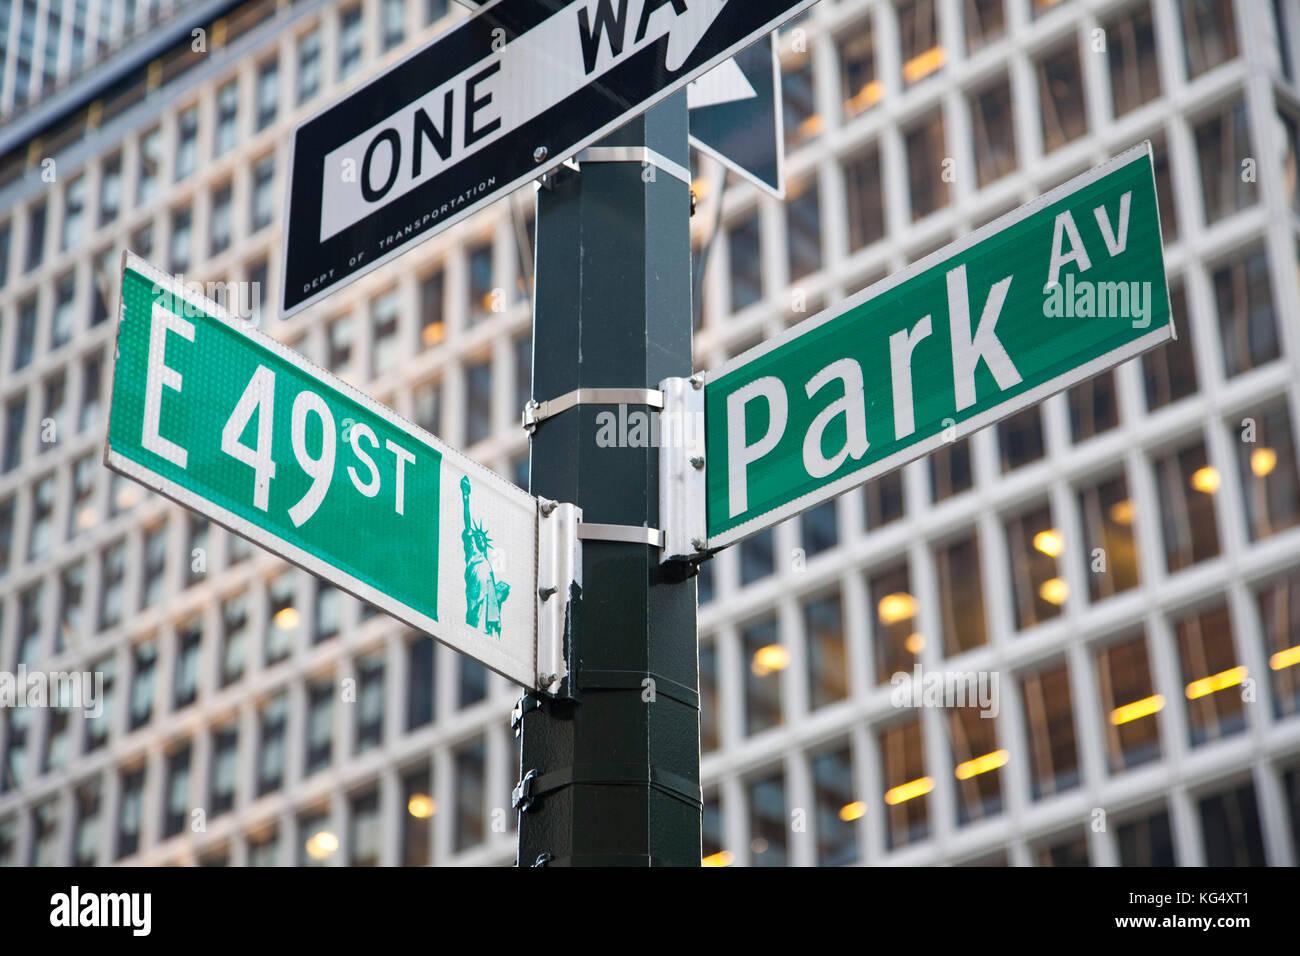 signboard, Park avenue, skyscraper, midtown, manhattan, new york, usa, america - Stock Image